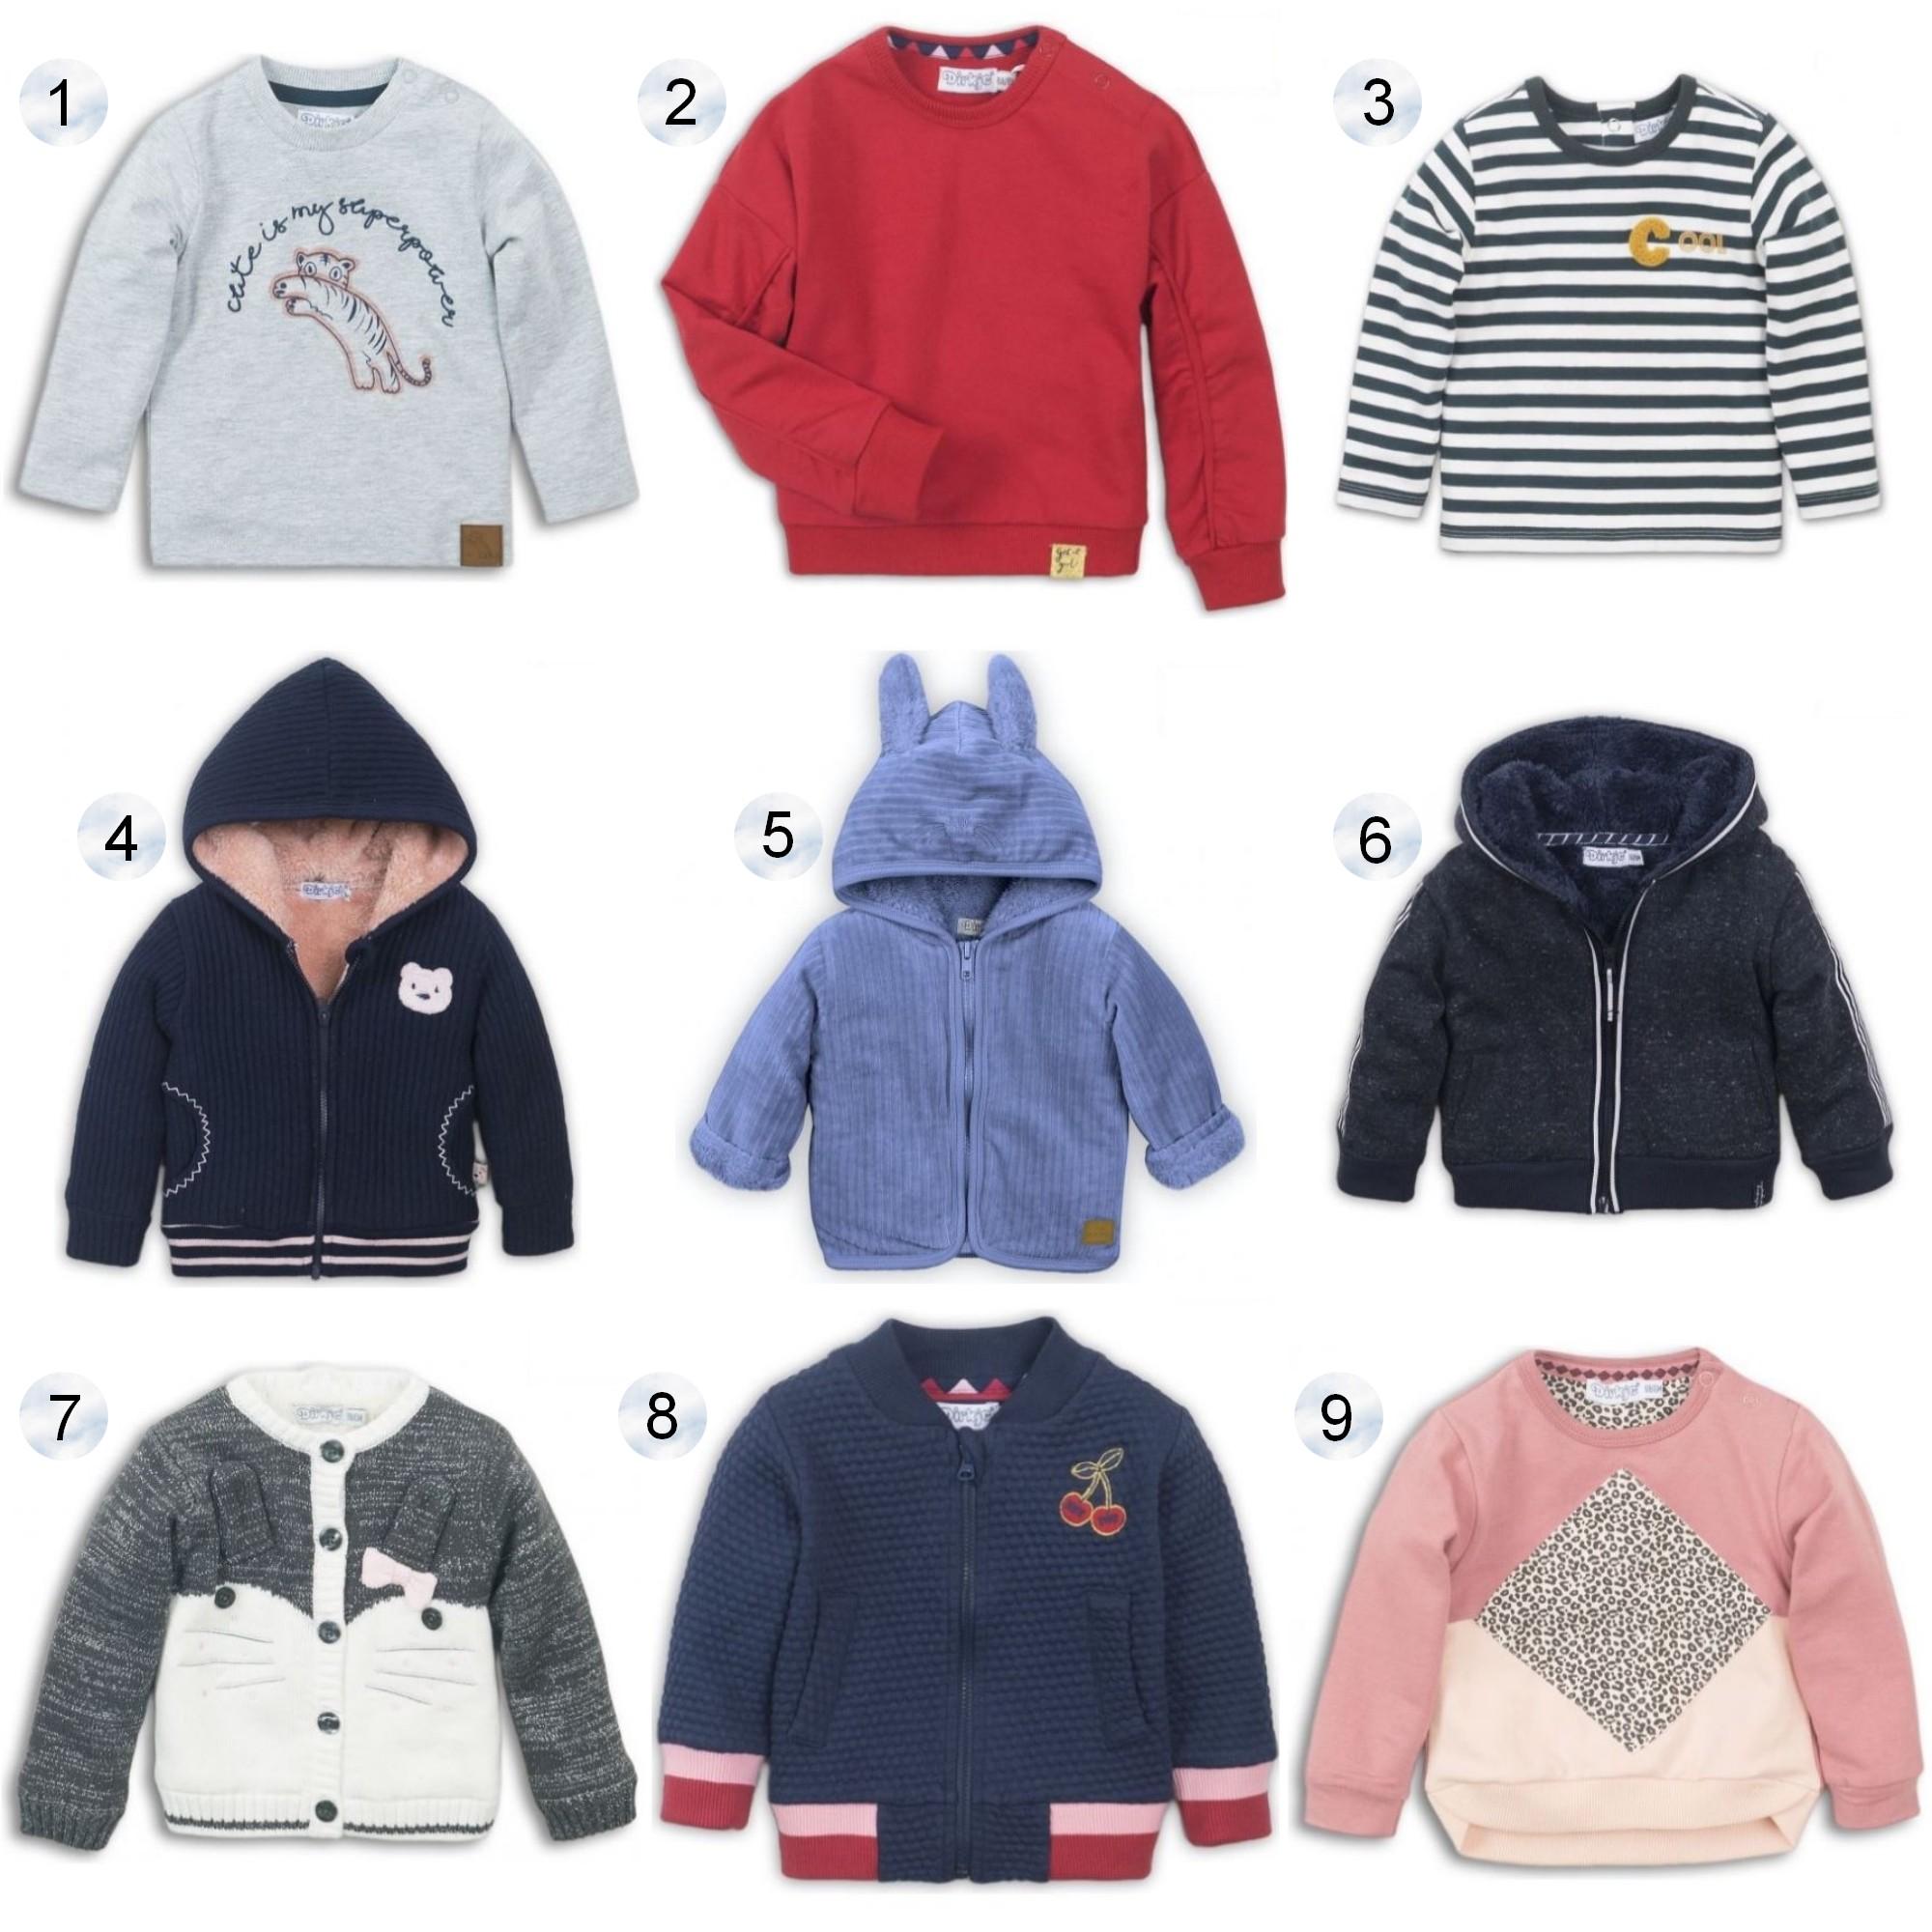 Dirkje babykleding baby kleren Jayno webshop kinderkleding winter winterkleren babytrui babyvest blog